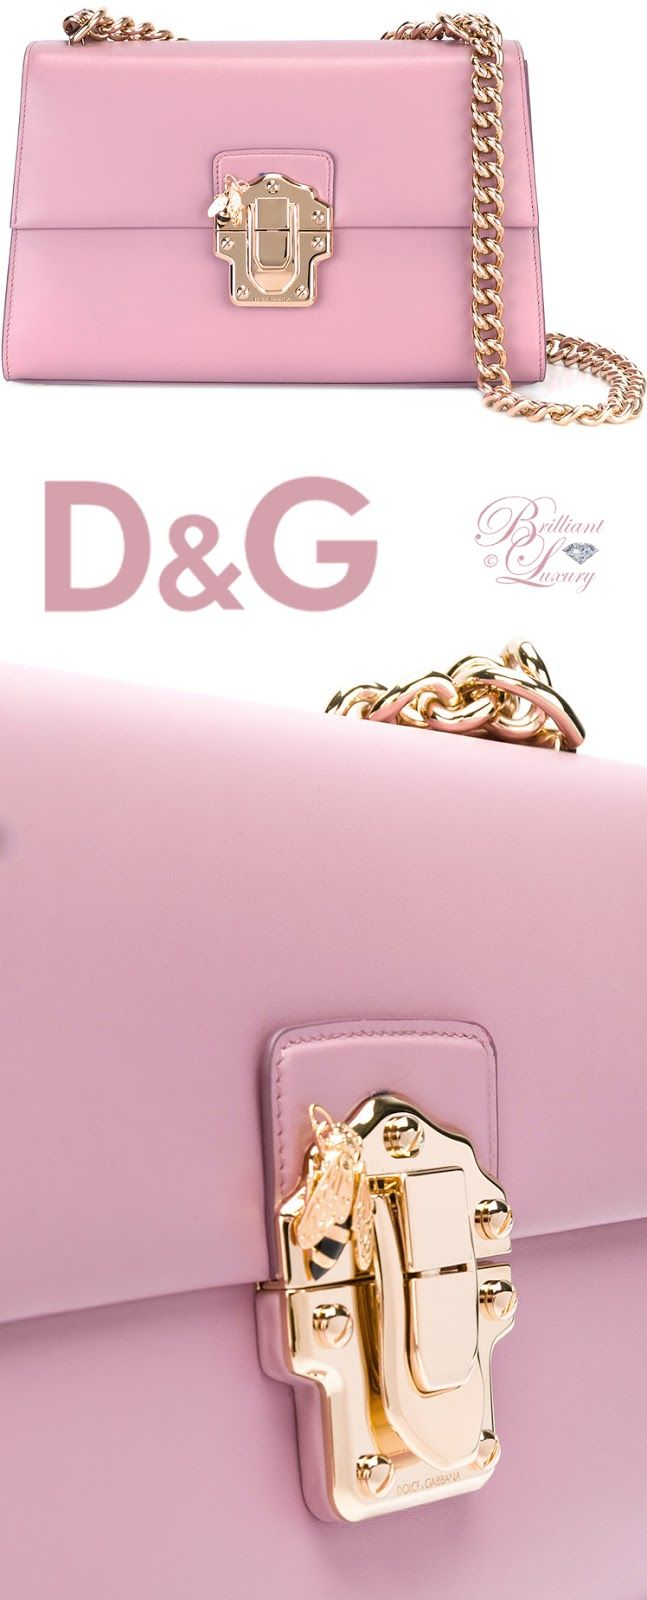 Brilliant Luxury by Emmy DE ♦ Dolce & Gabbana Chain Strap Shoulder Bag